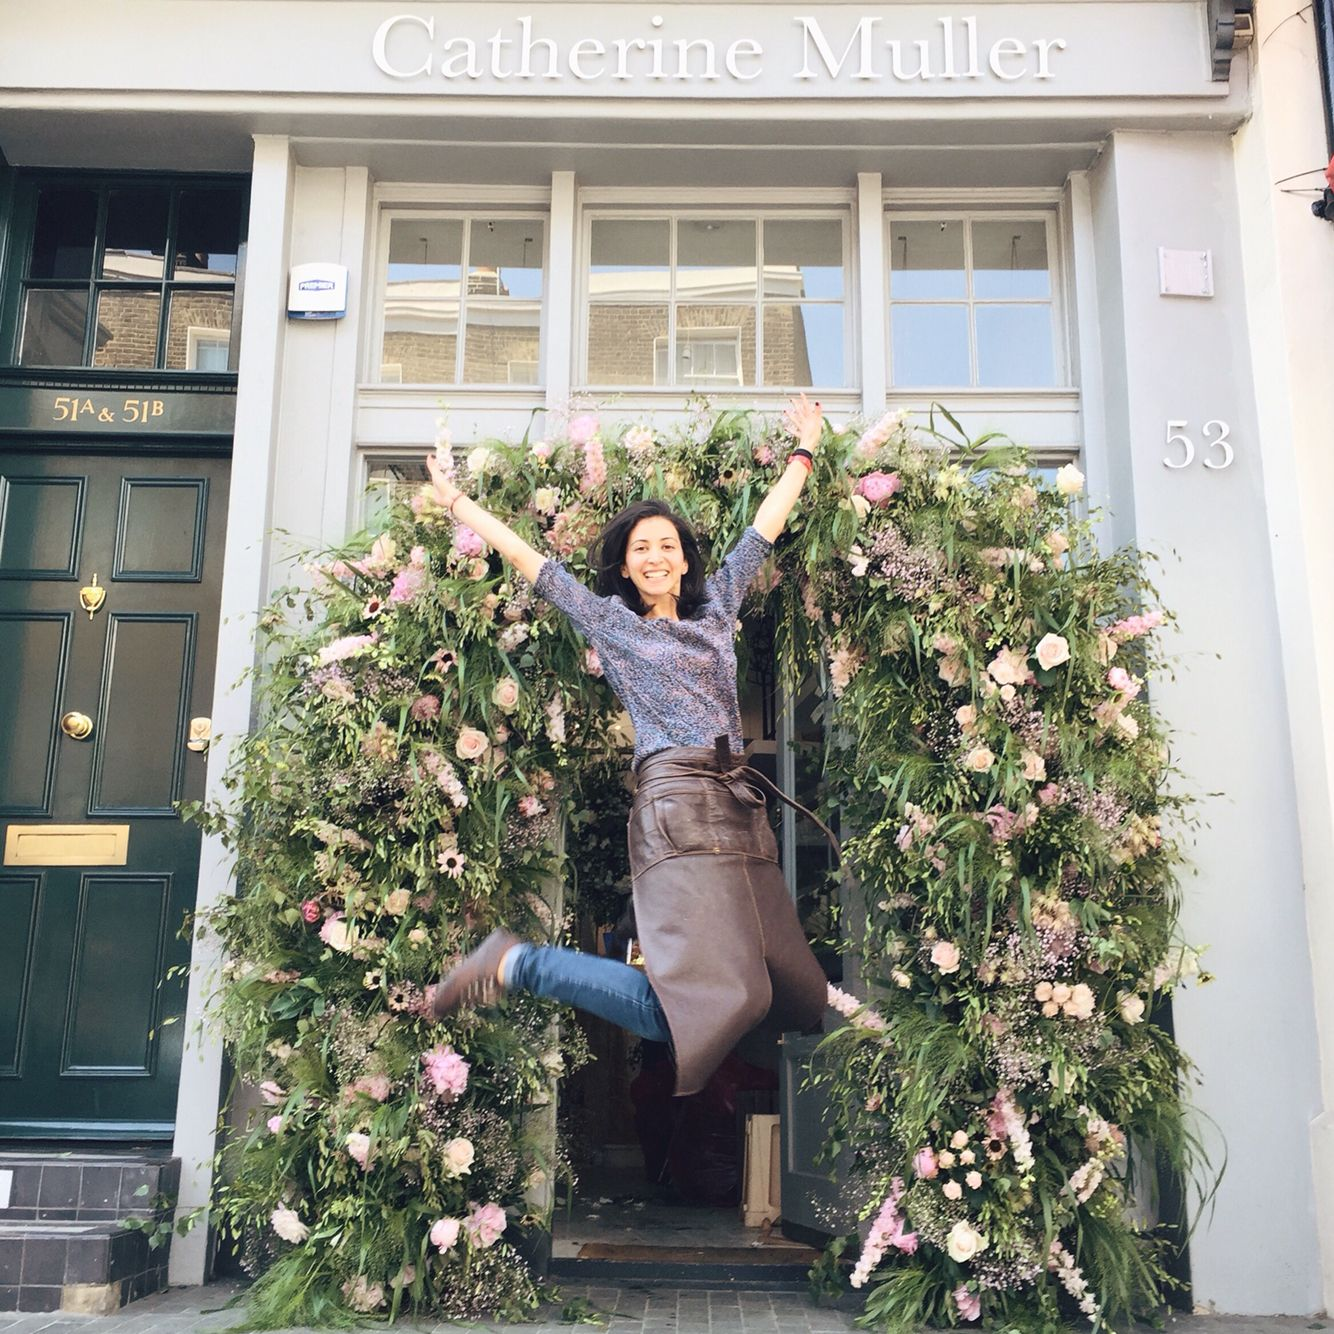 Wedding Flower Arch. Catherine Muller Flower School In